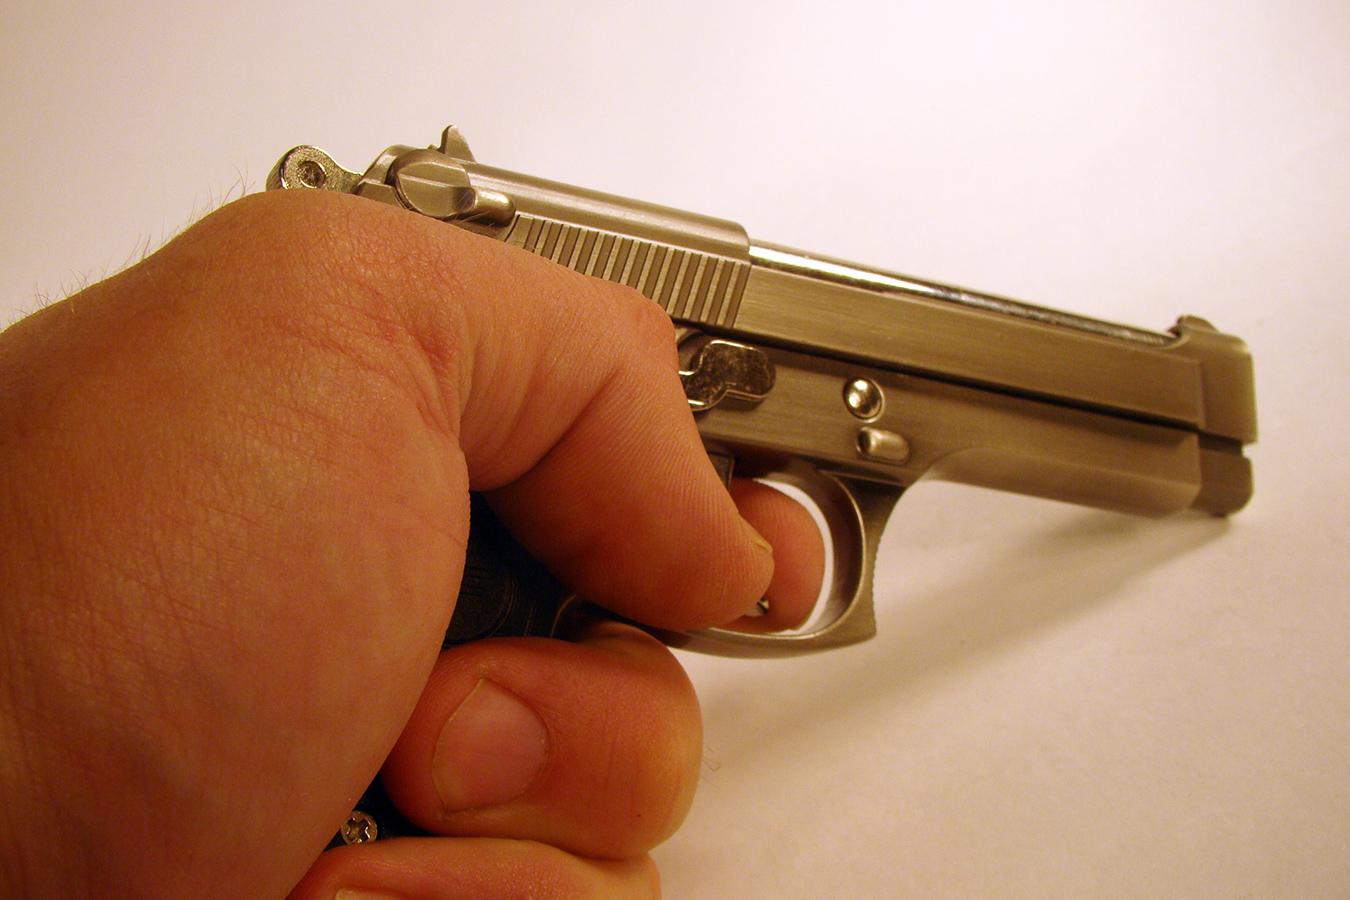 Beretta 92FS 15 см серая изображение 1